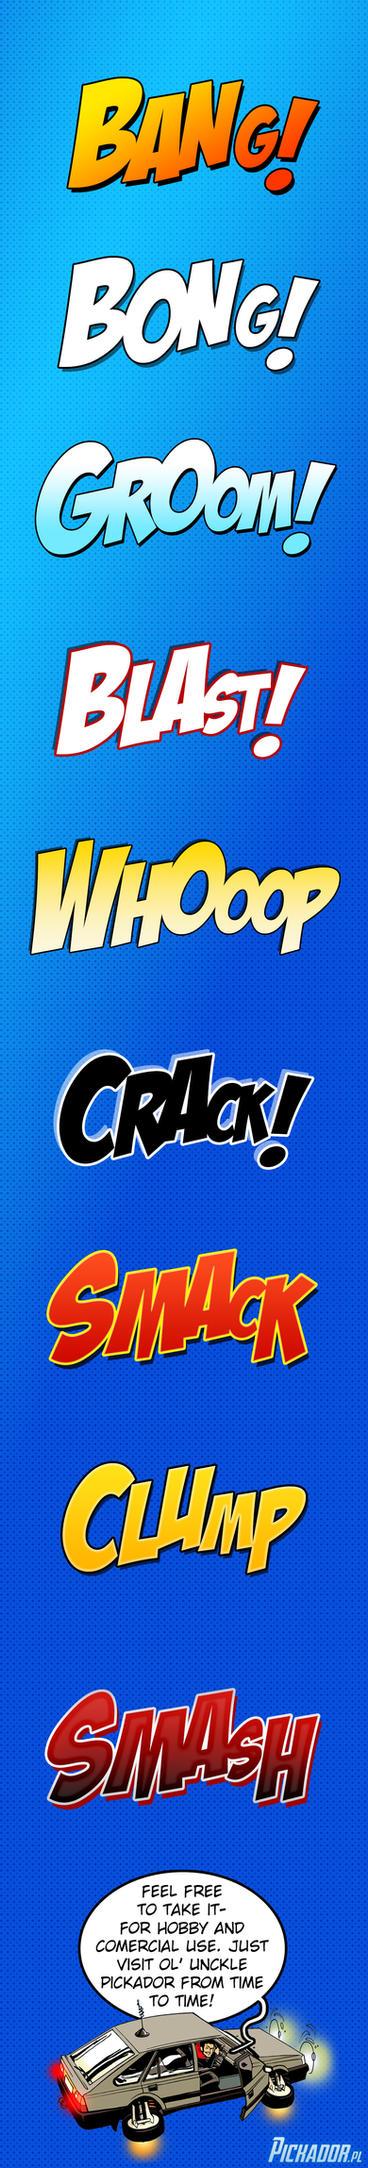 Comics onomatopoeia Photoshop styles by Pickador